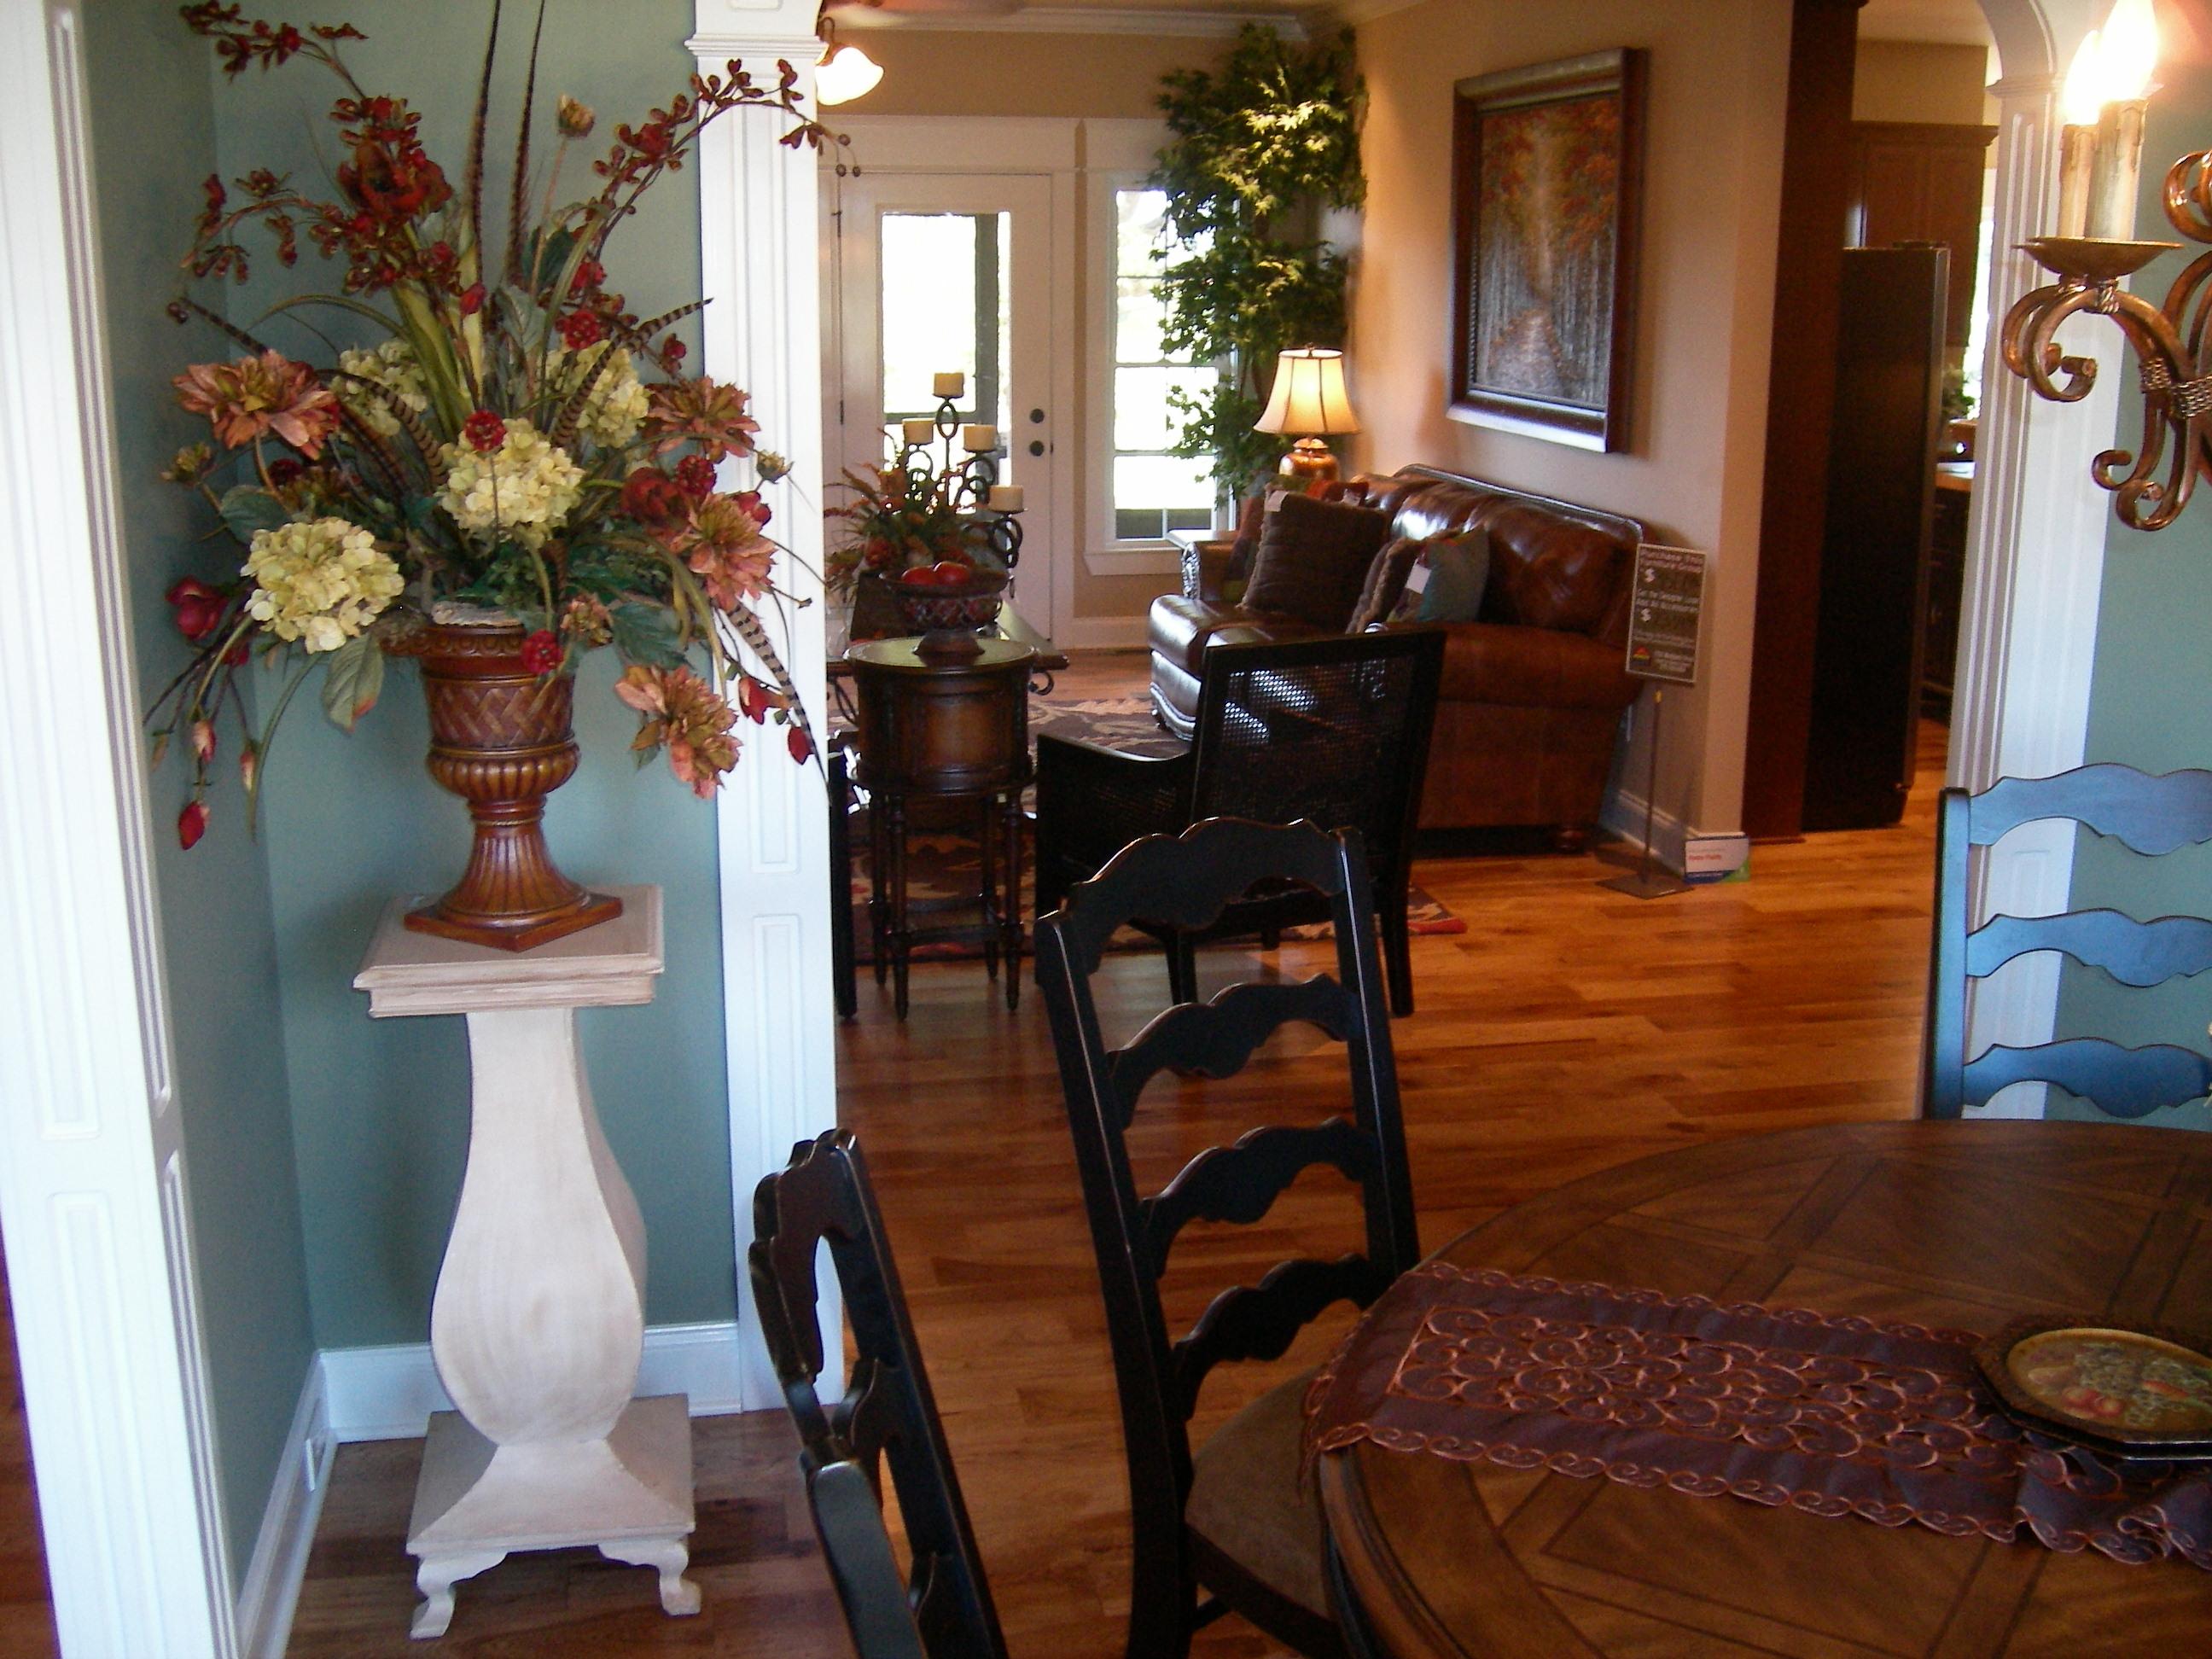 Ashley Furniture HomeStore Donates 5000 to St Jude Dream Home